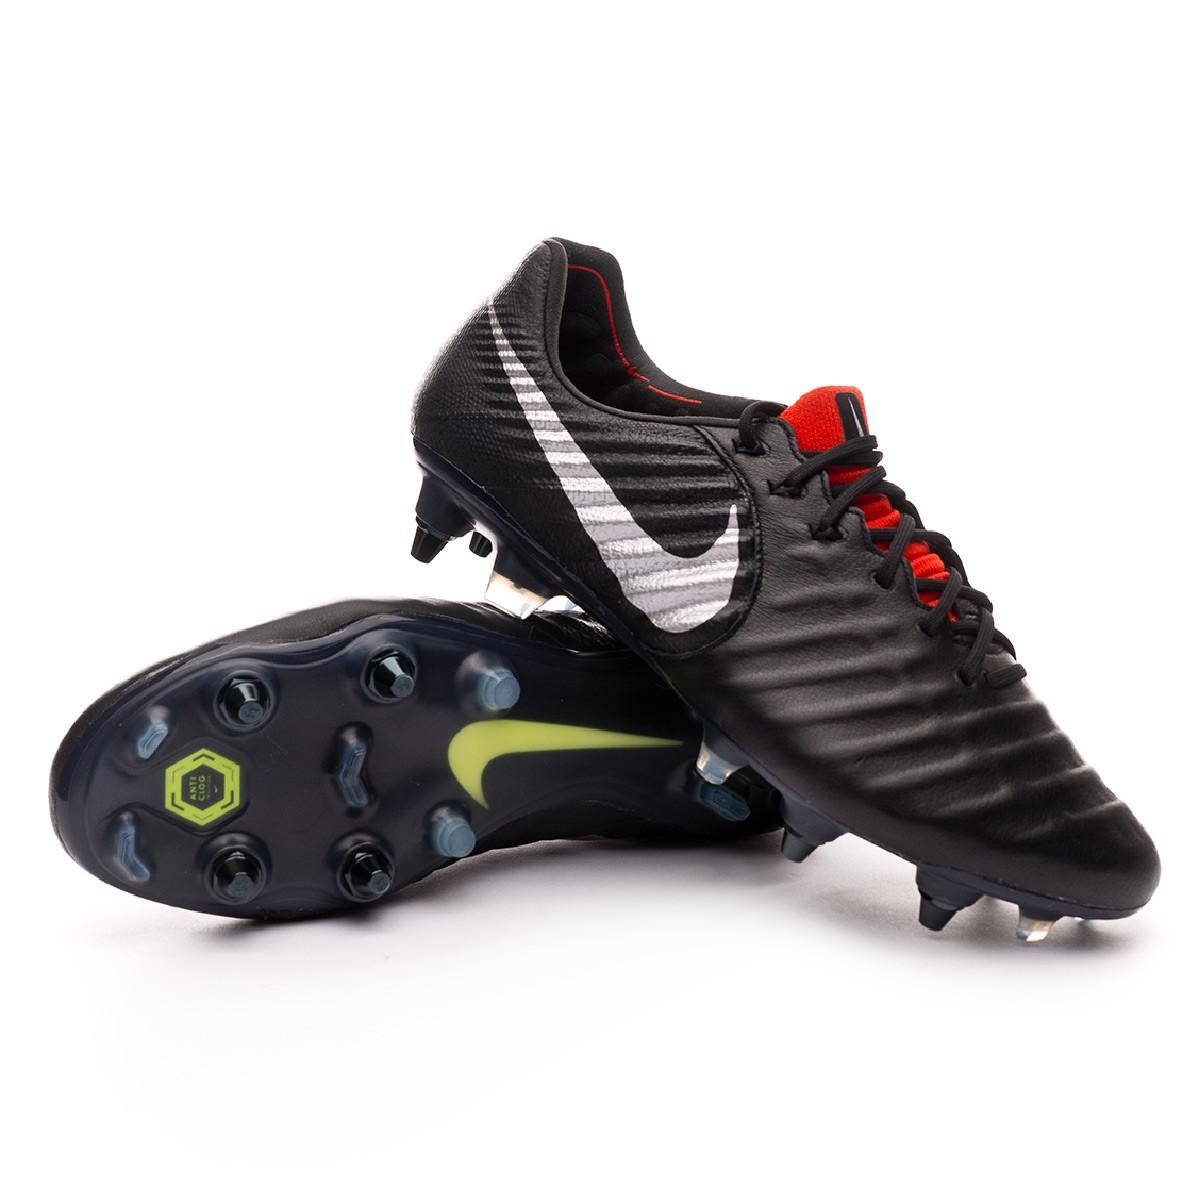 4bdfcf2af1e2 Football Boots Nike Tiempo Legend VII Elite Anti-Clog SG-Pro Black-Metallic  silver-Light crimson - Football store Fútbol Emotion